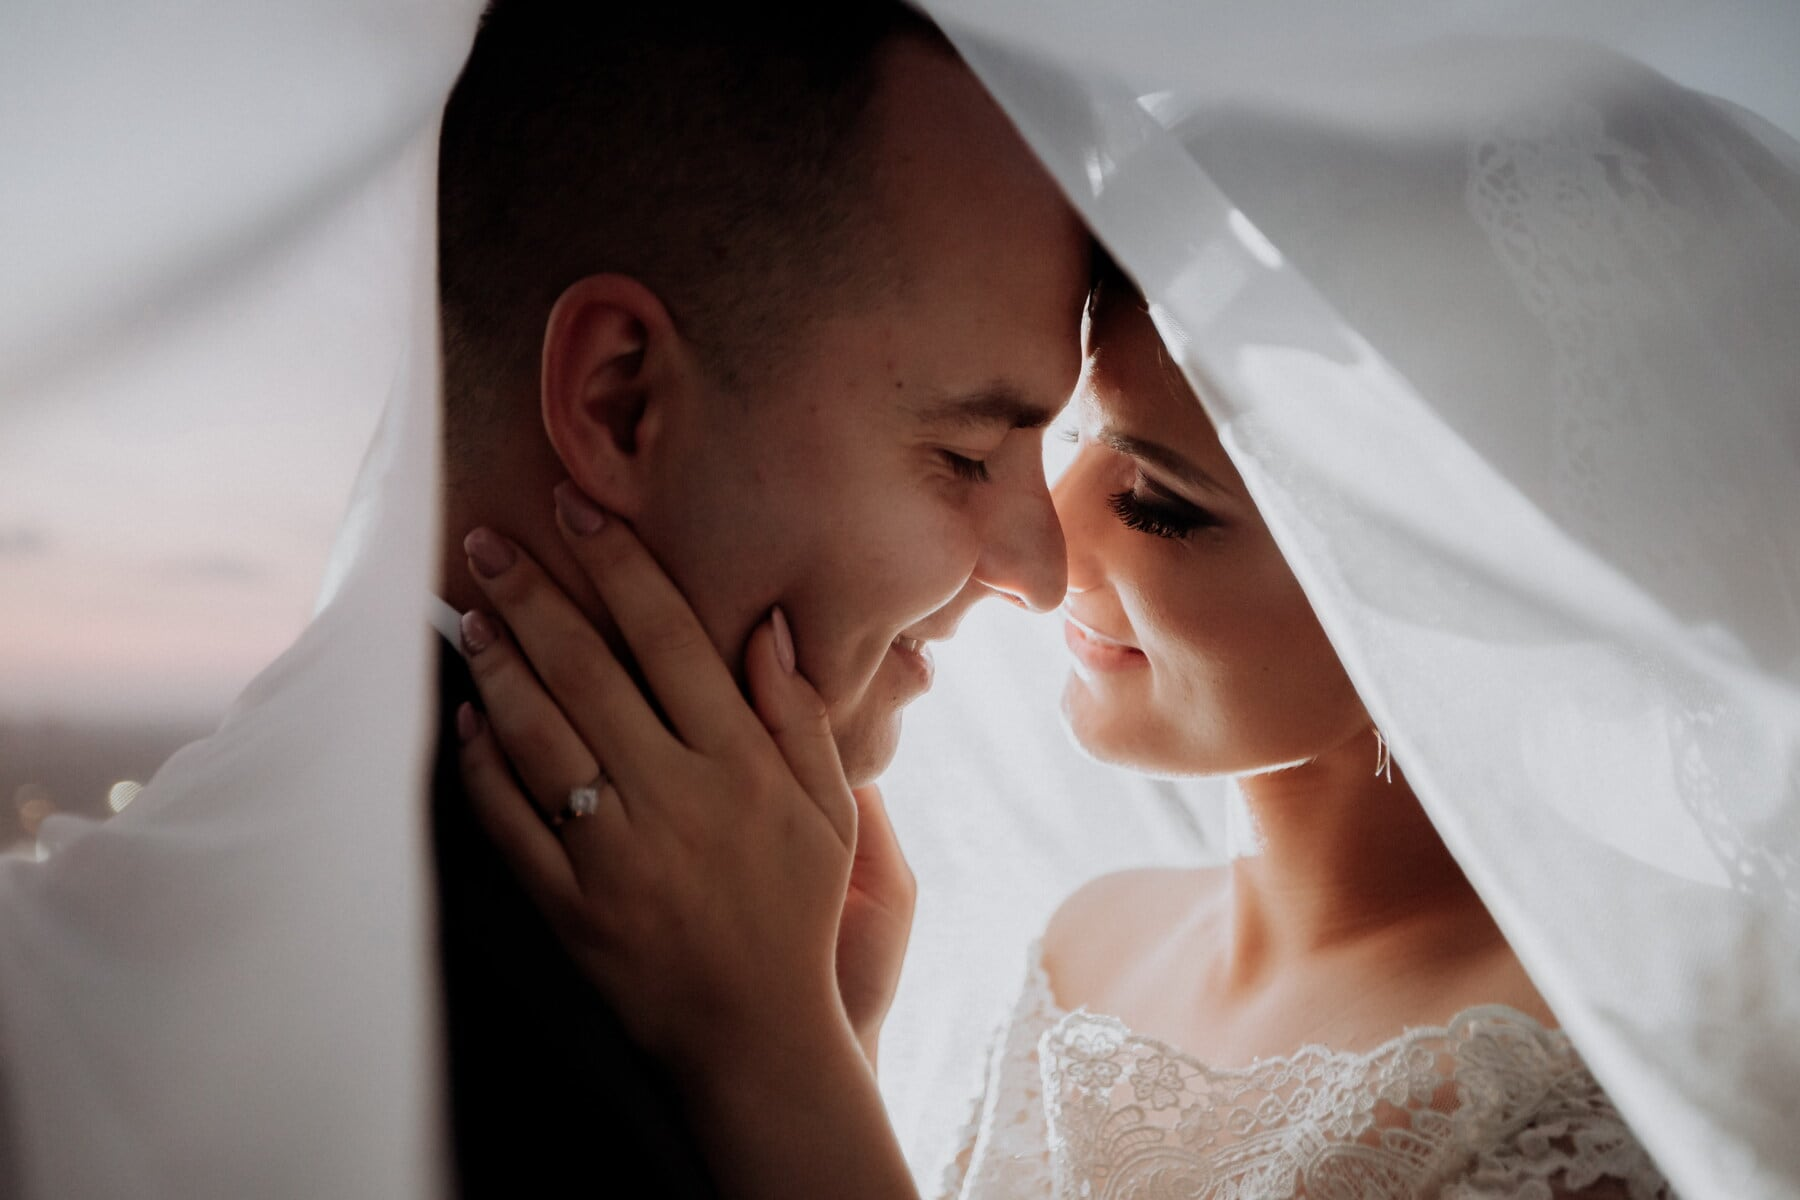 newlyweds, groom, bride, underneath, veil, wedding dress, kiss, wedding, love, woman